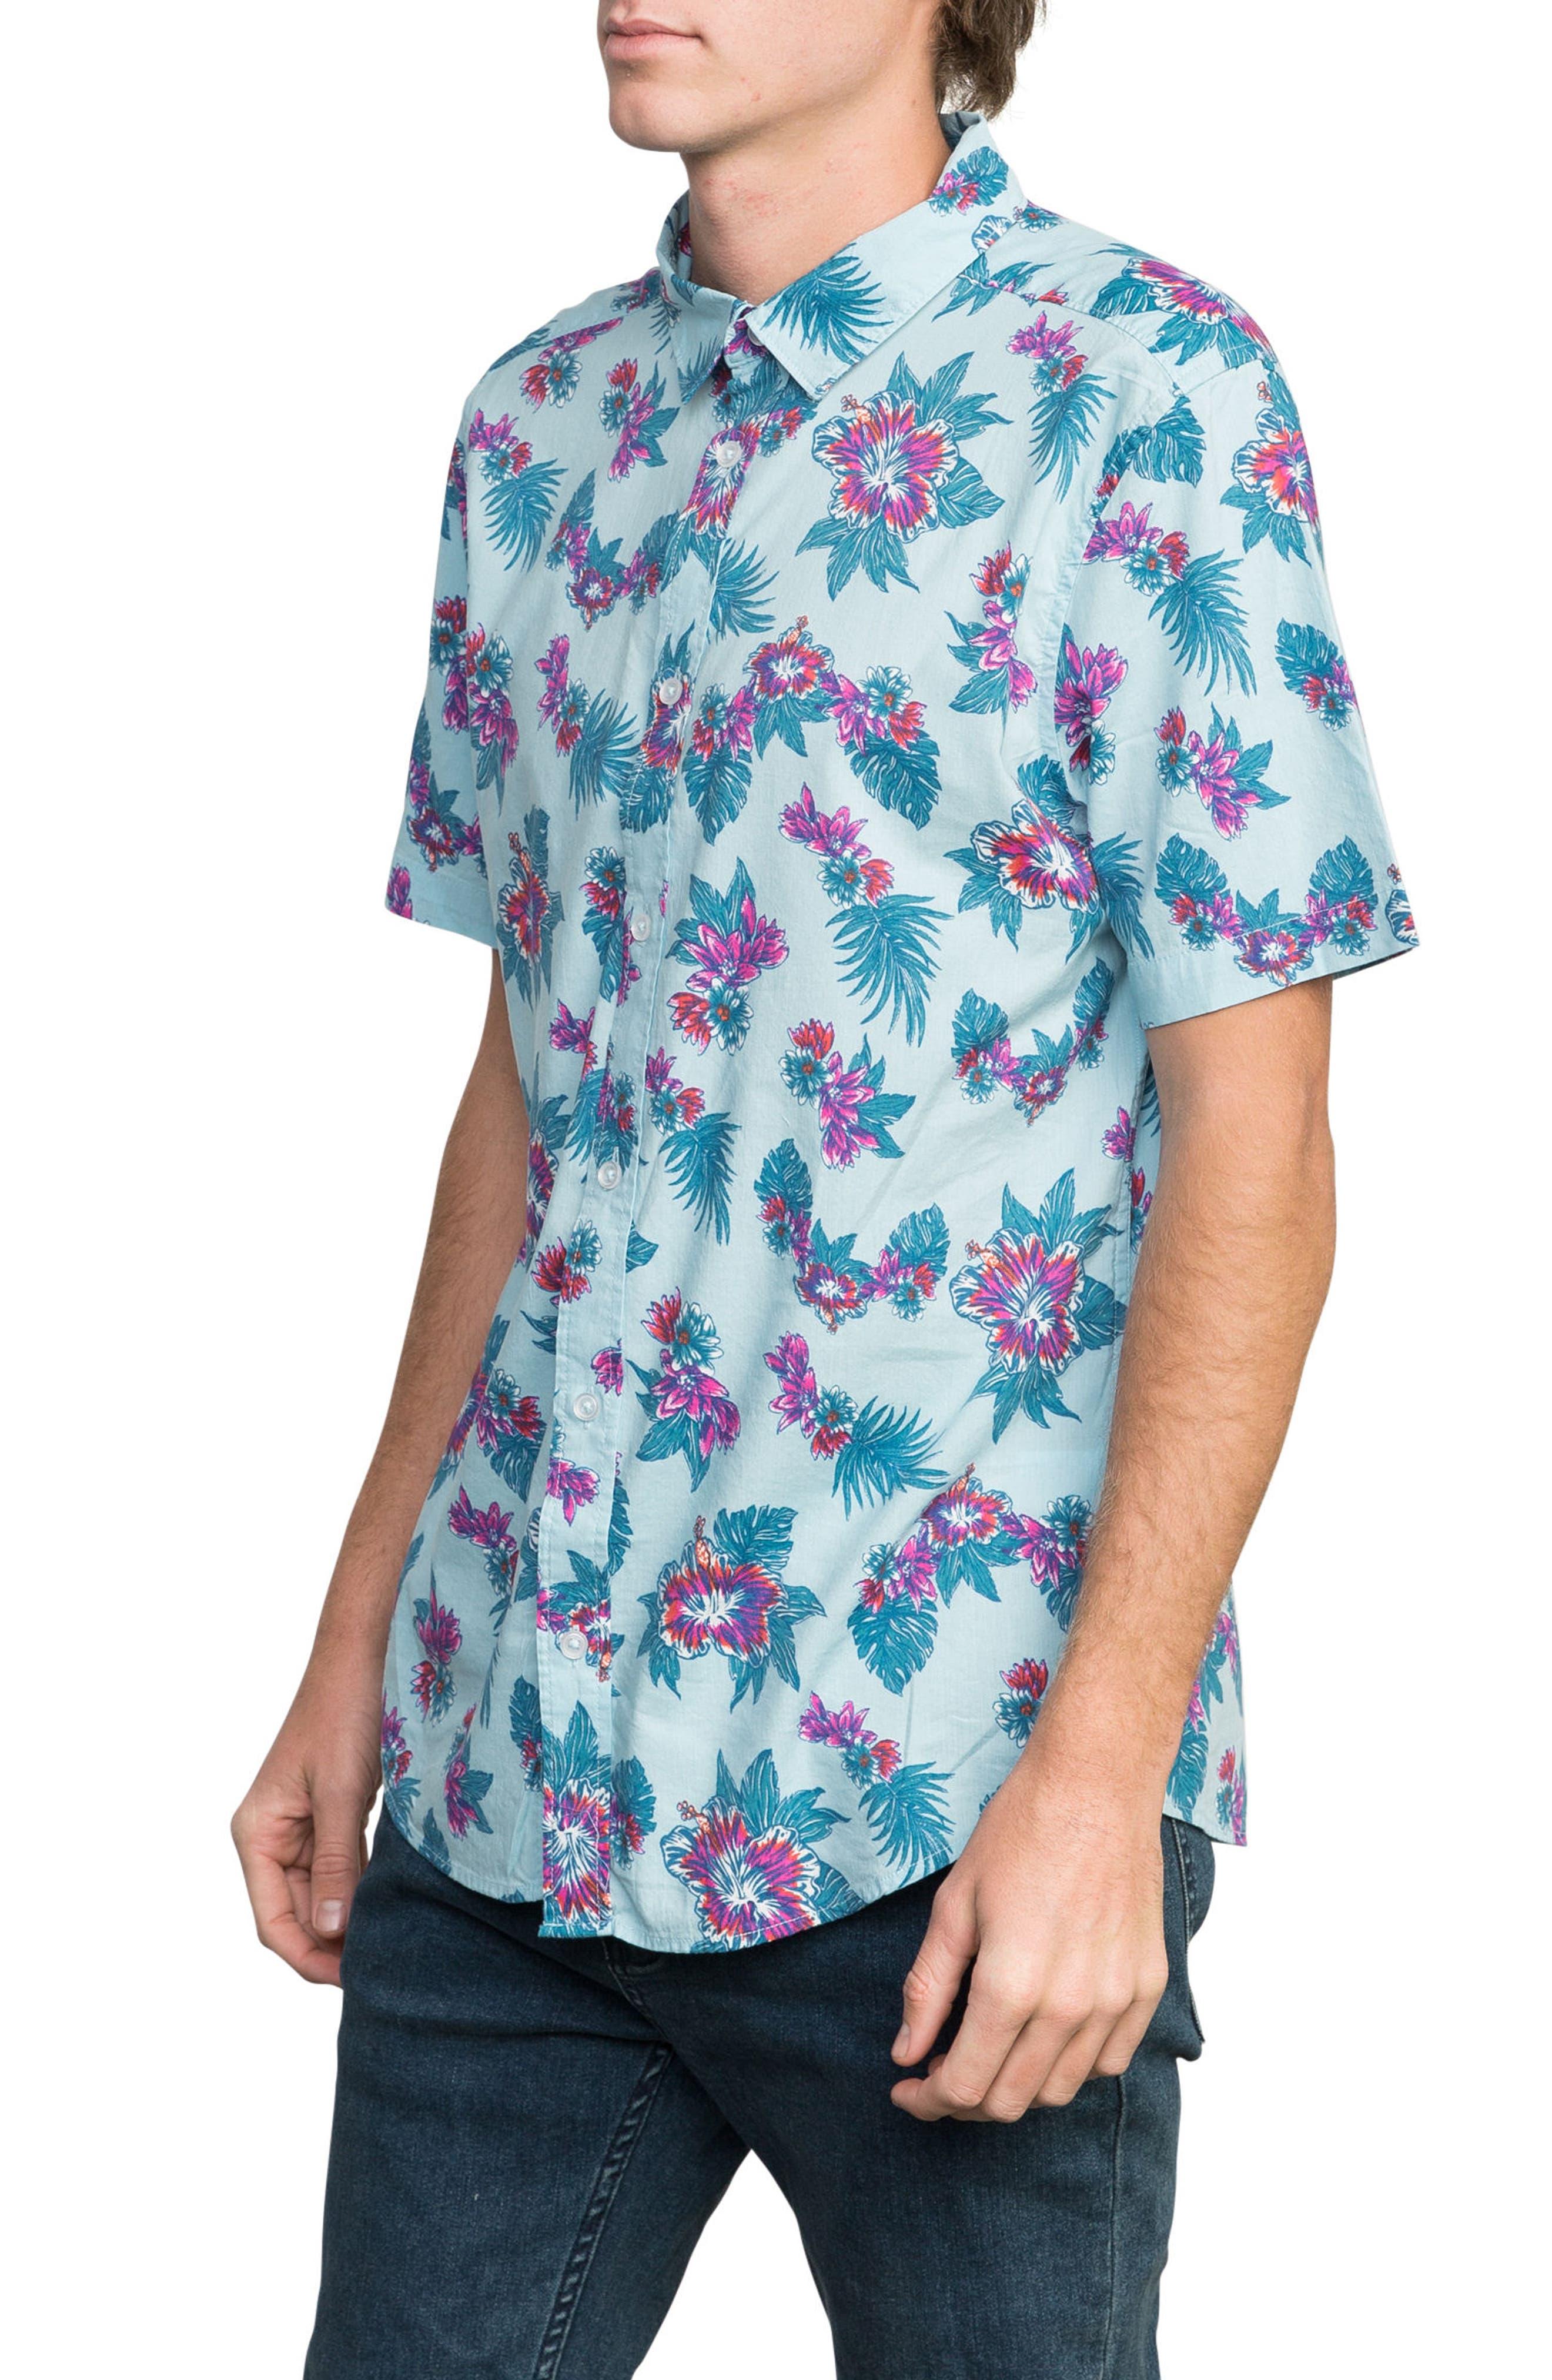 McMillan Floral Woven Shirt,                             Alternate thumbnail 3, color,                             Blue Floral